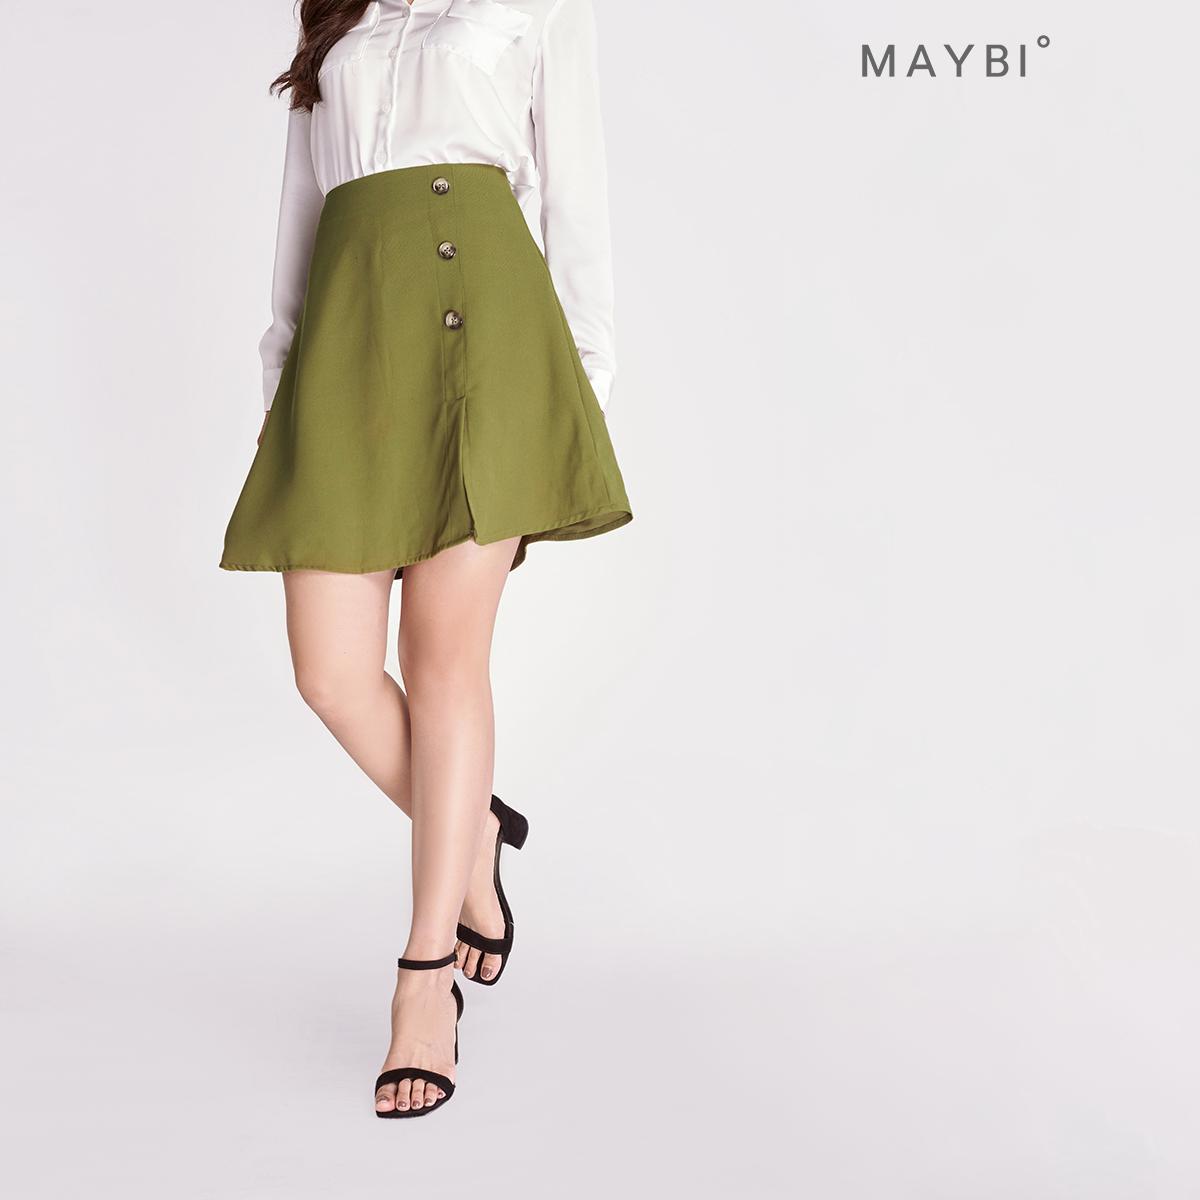 MAYBI – Chân váy lụa chéo Skater A Skirt